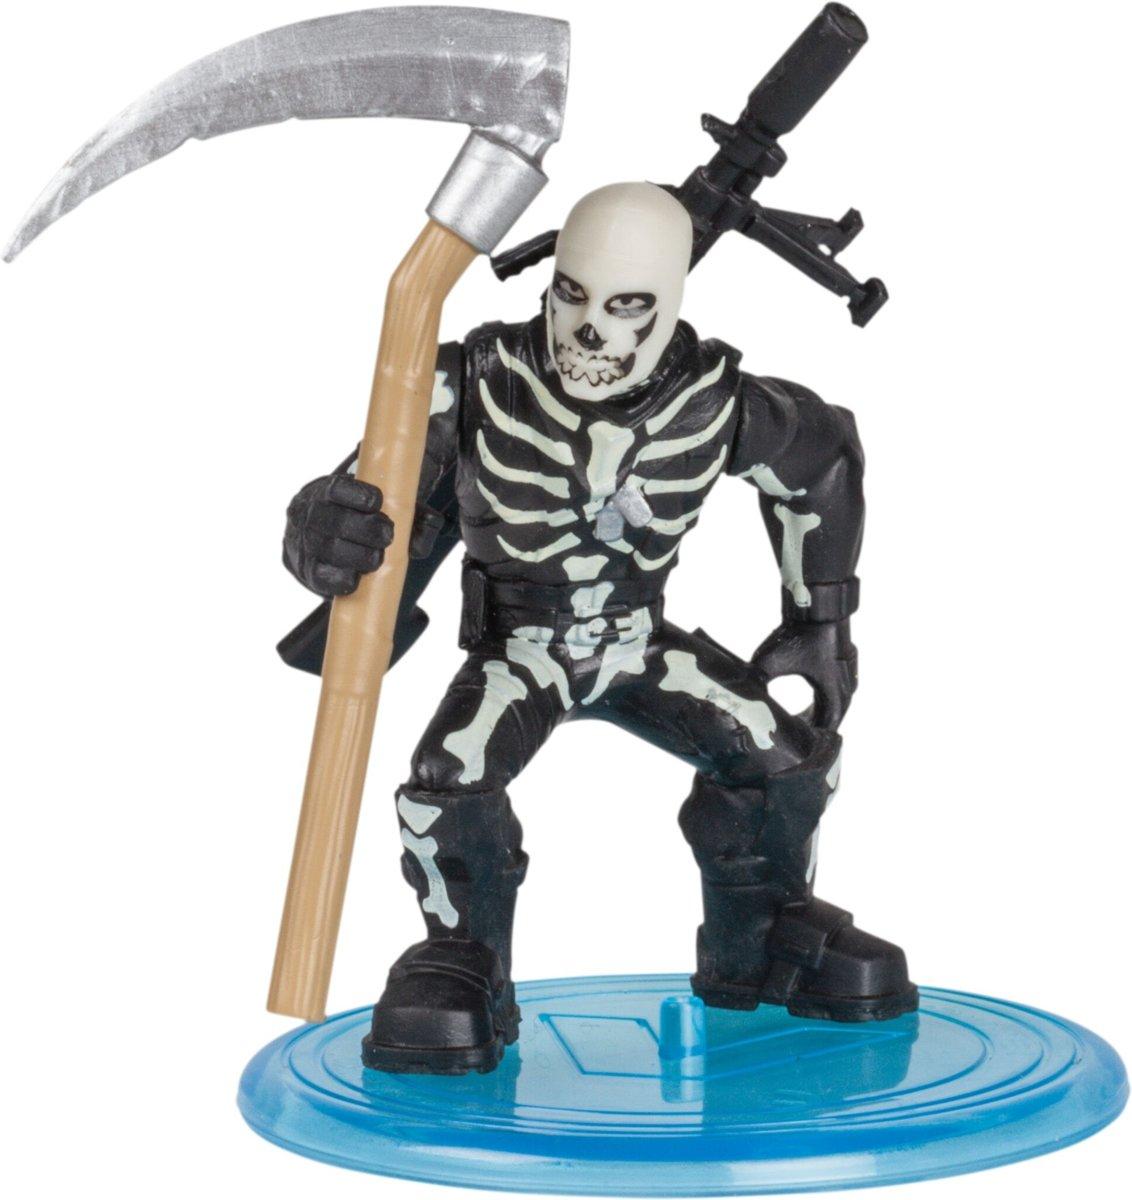 Moose Toys Fortnite Battle Royale Collection - Carbide Zwart